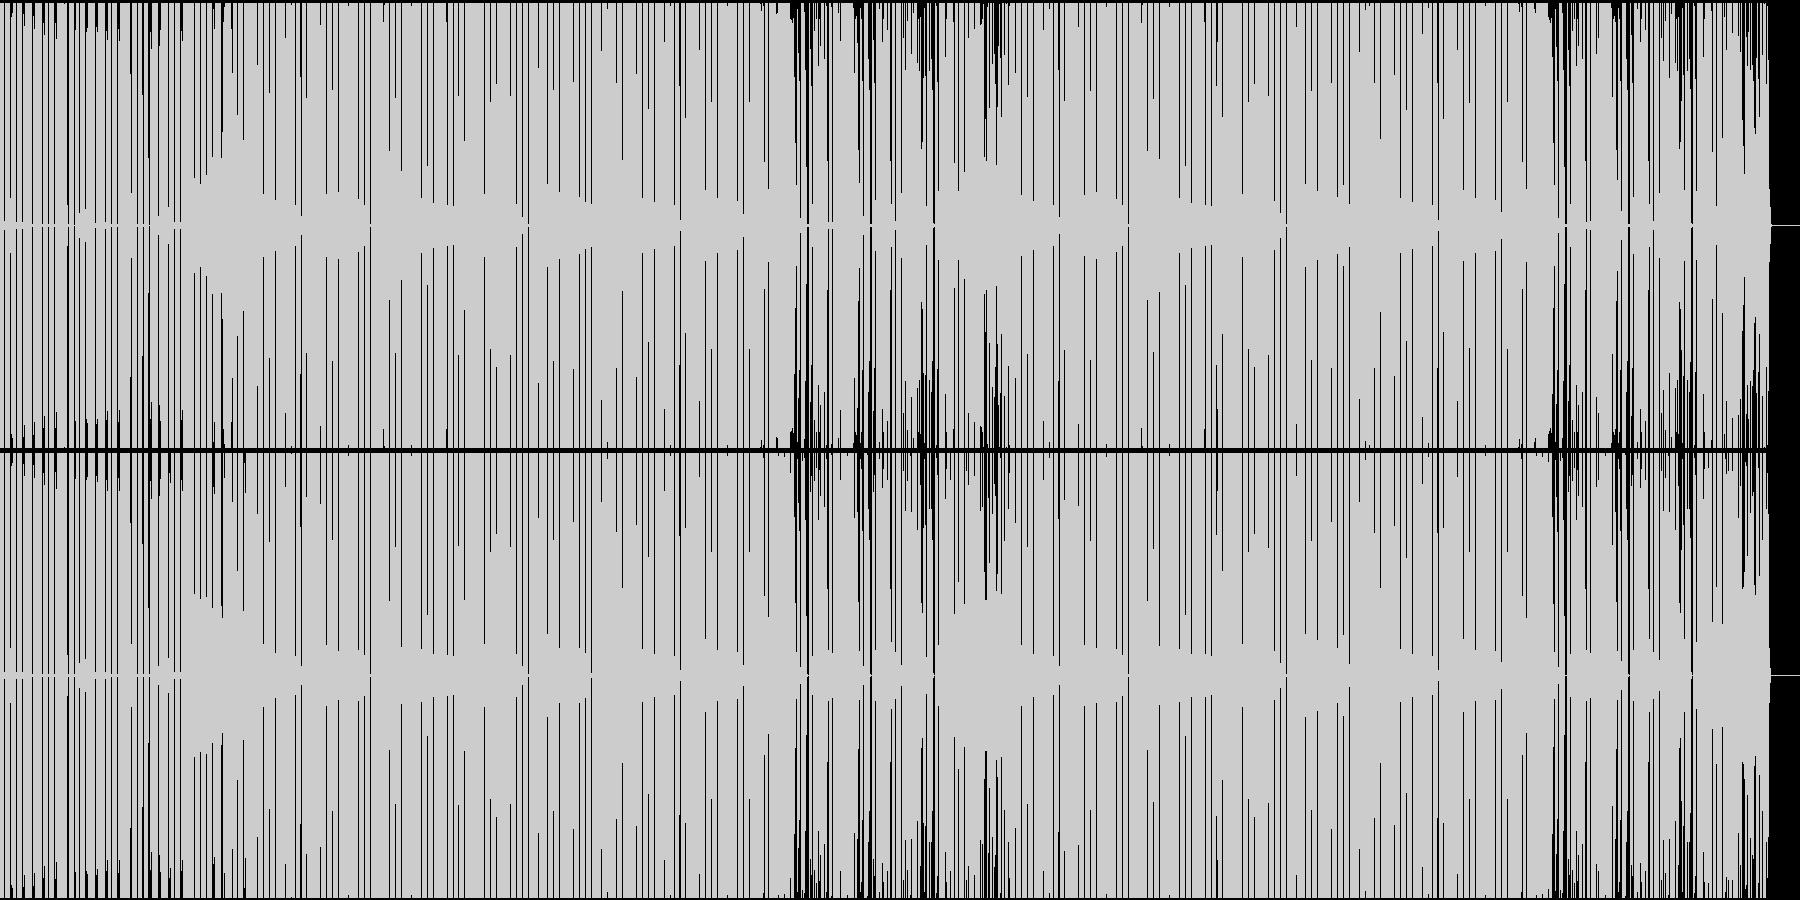 RPG・戦闘・8bit・チップチューンの未再生の波形